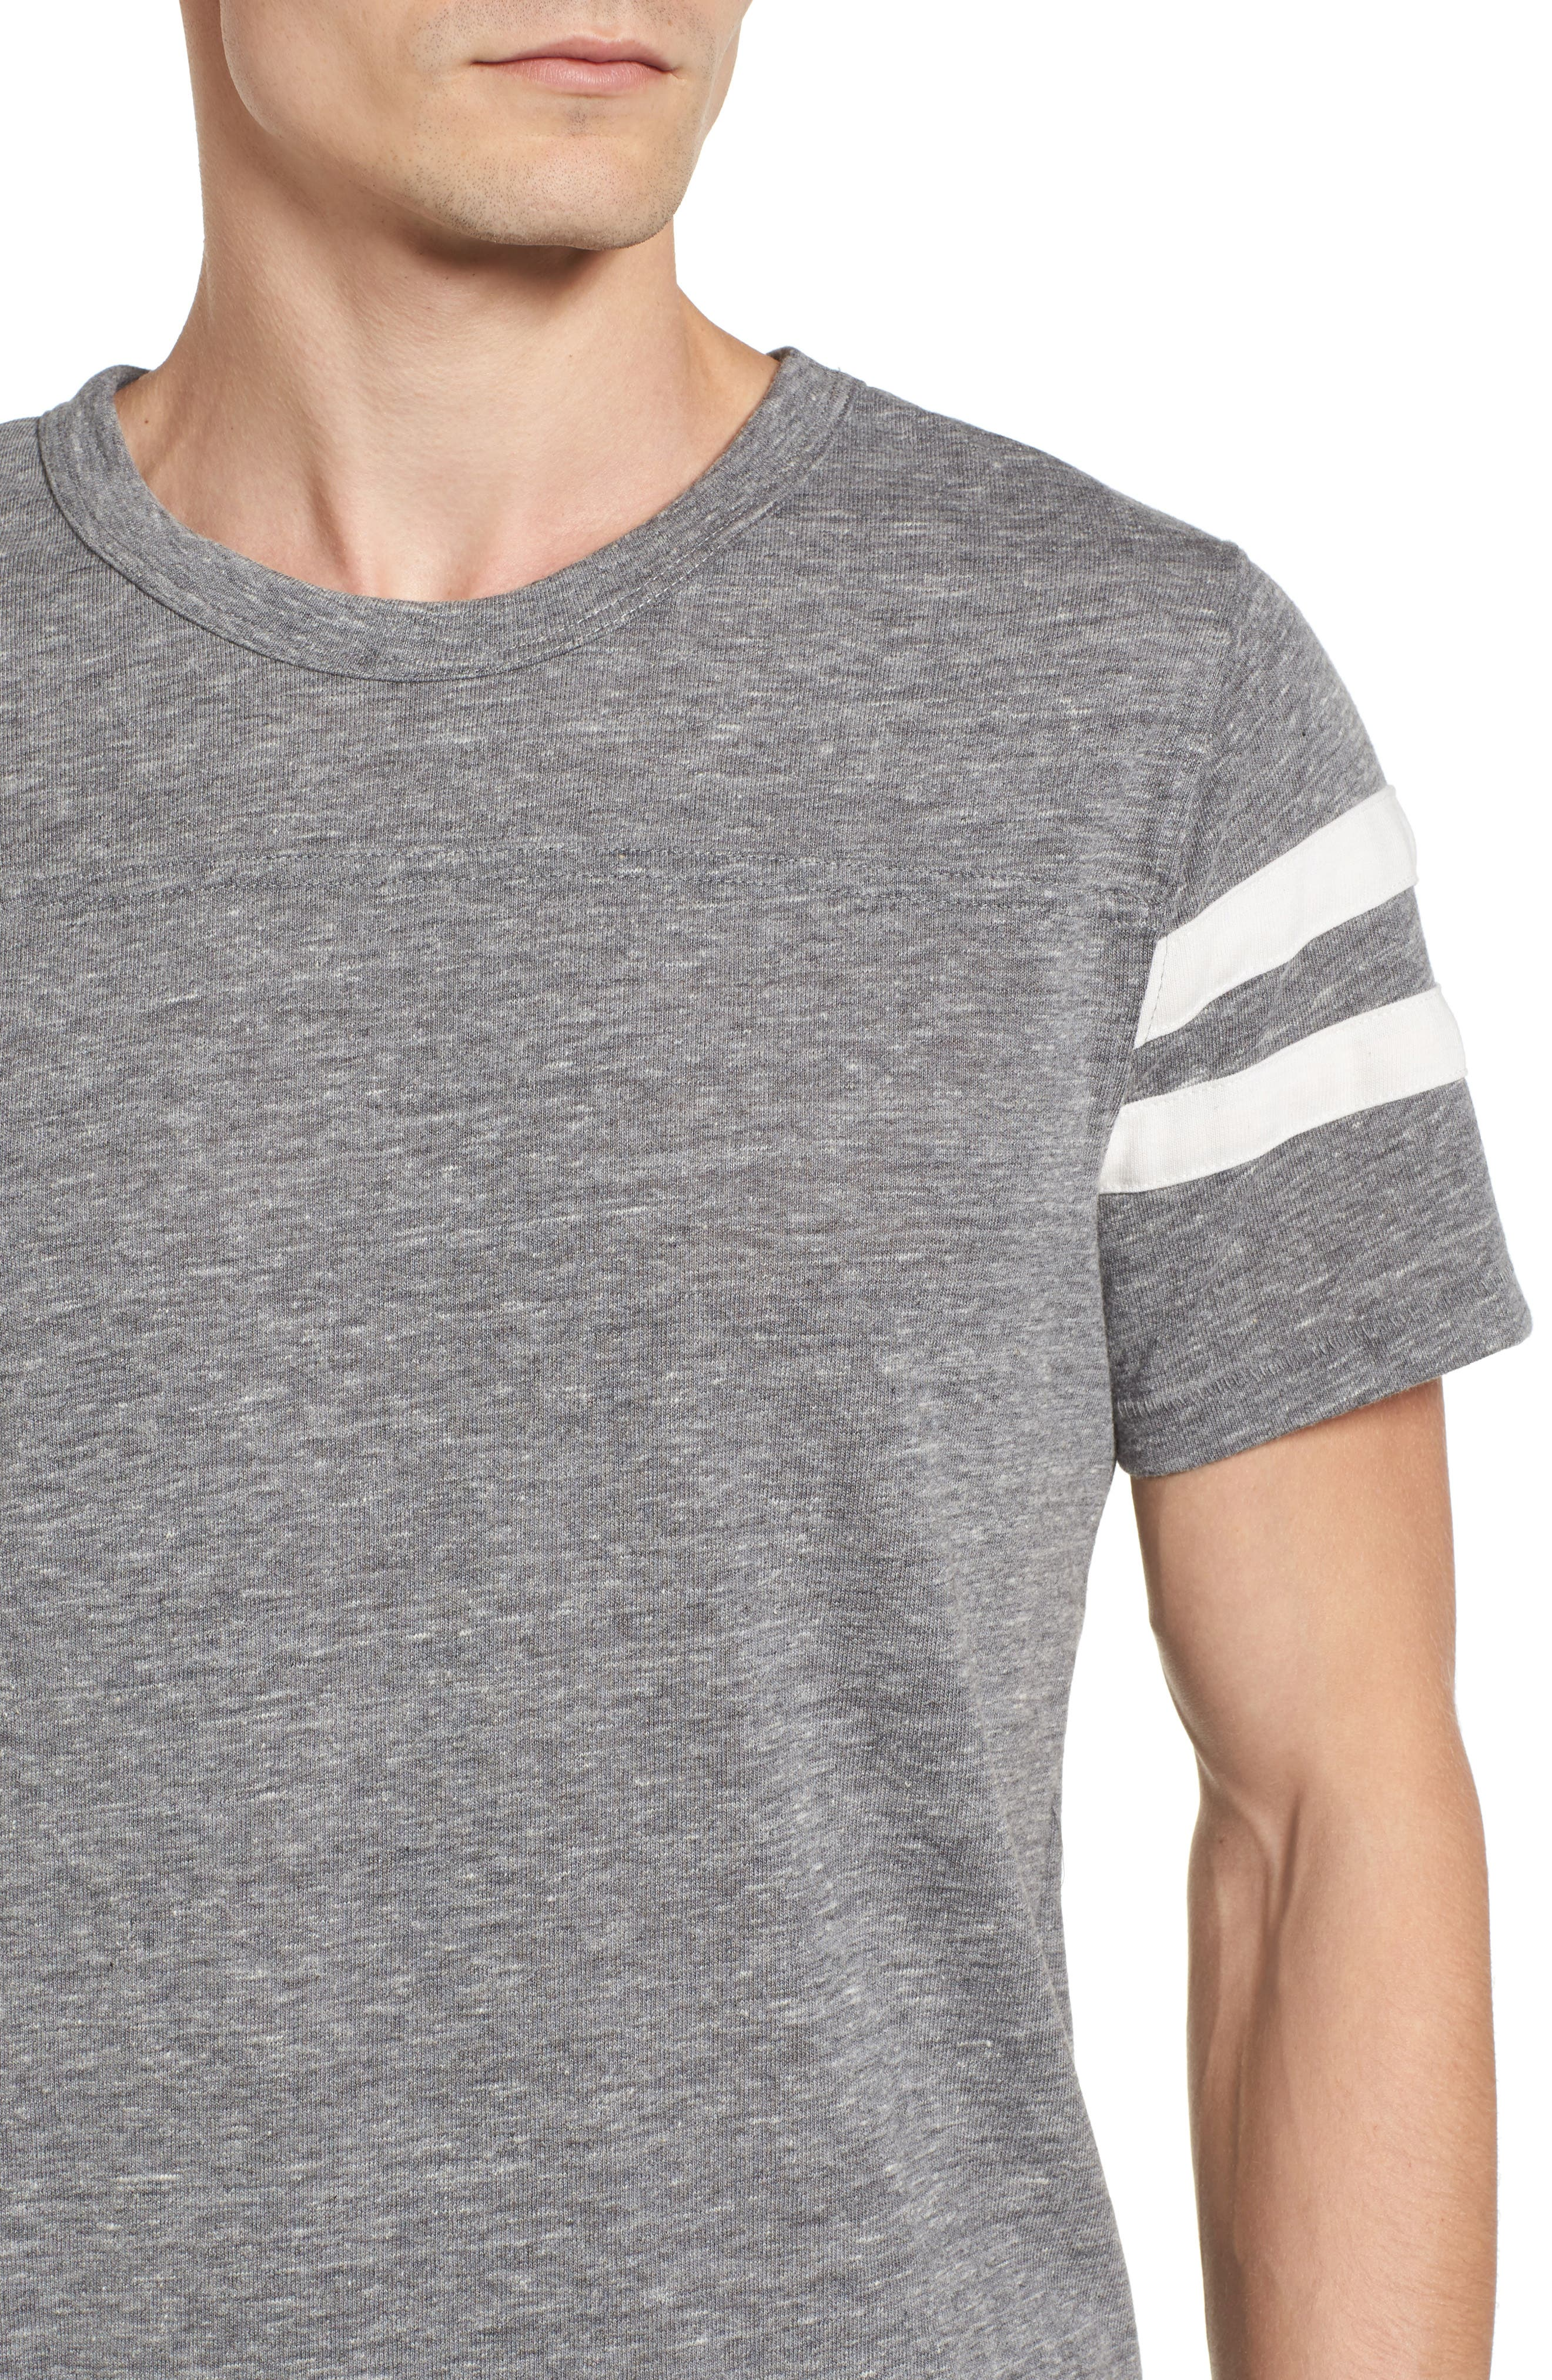 Football T-Shirt,                             Alternate thumbnail 4, color,                             Eco Grey/ Eco Ivory